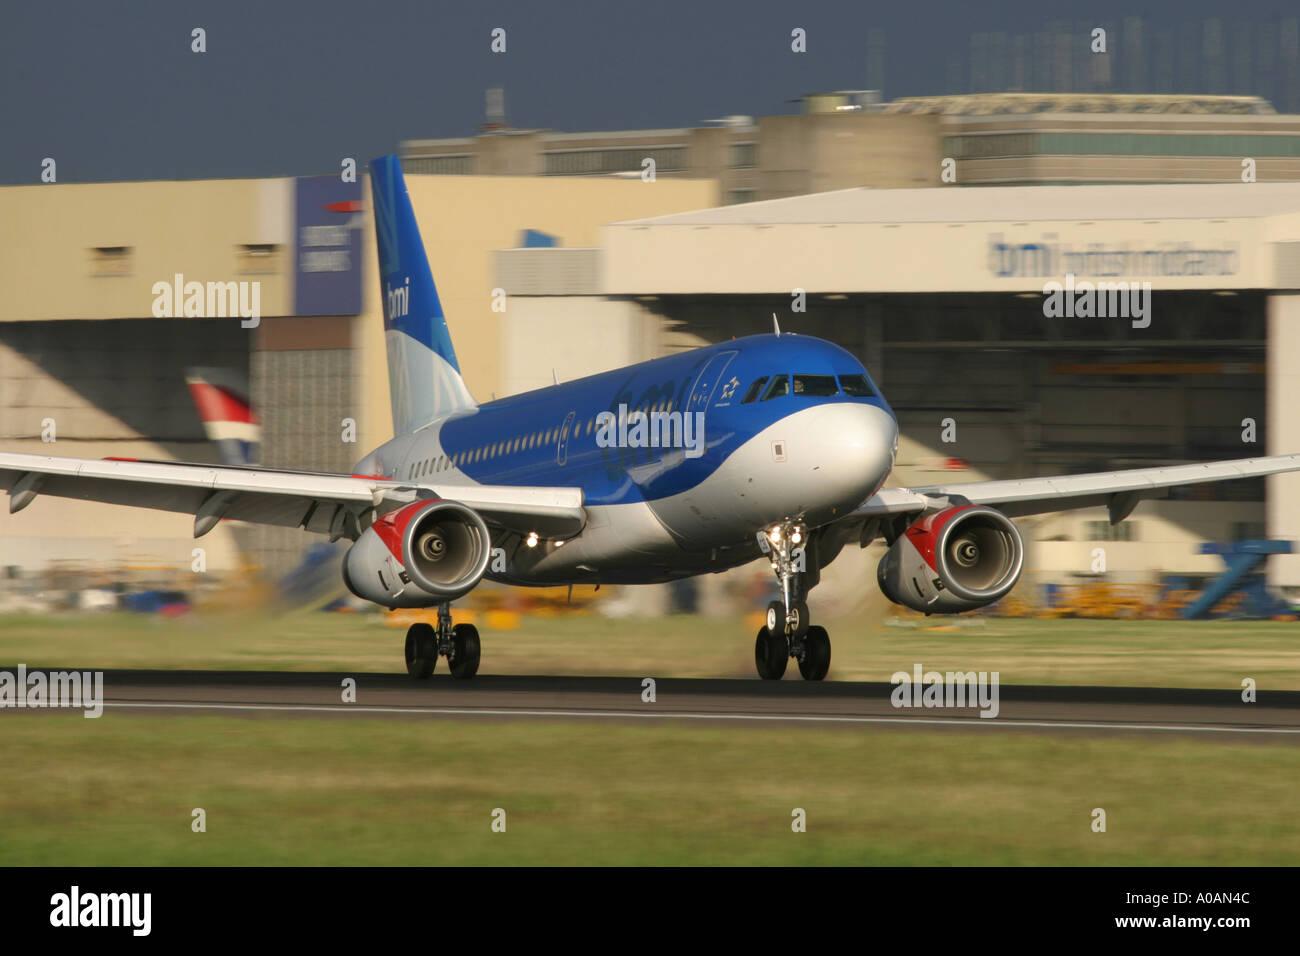 BMI British Midland Airbus A319 131 London Heathrow UK - Stock Image